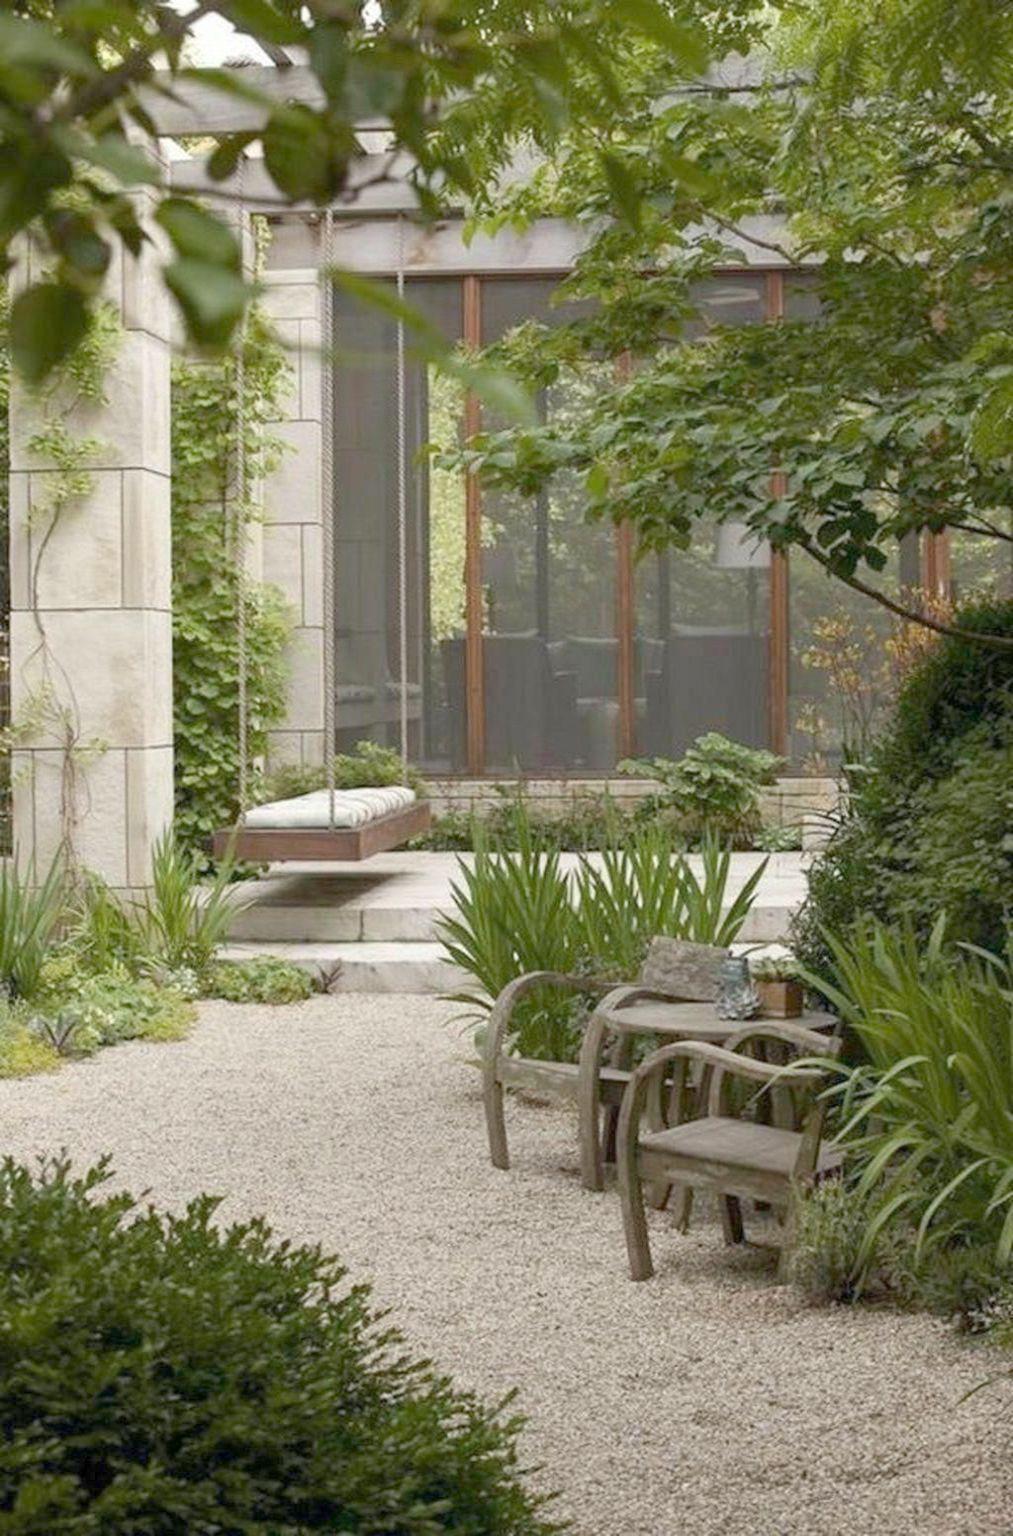 Landscape Gardening Jobs In New Zealand Following Landscape Gardening Essex Rather Landscape Gardening En Home Garden Design Landscape Design Front Yard Design